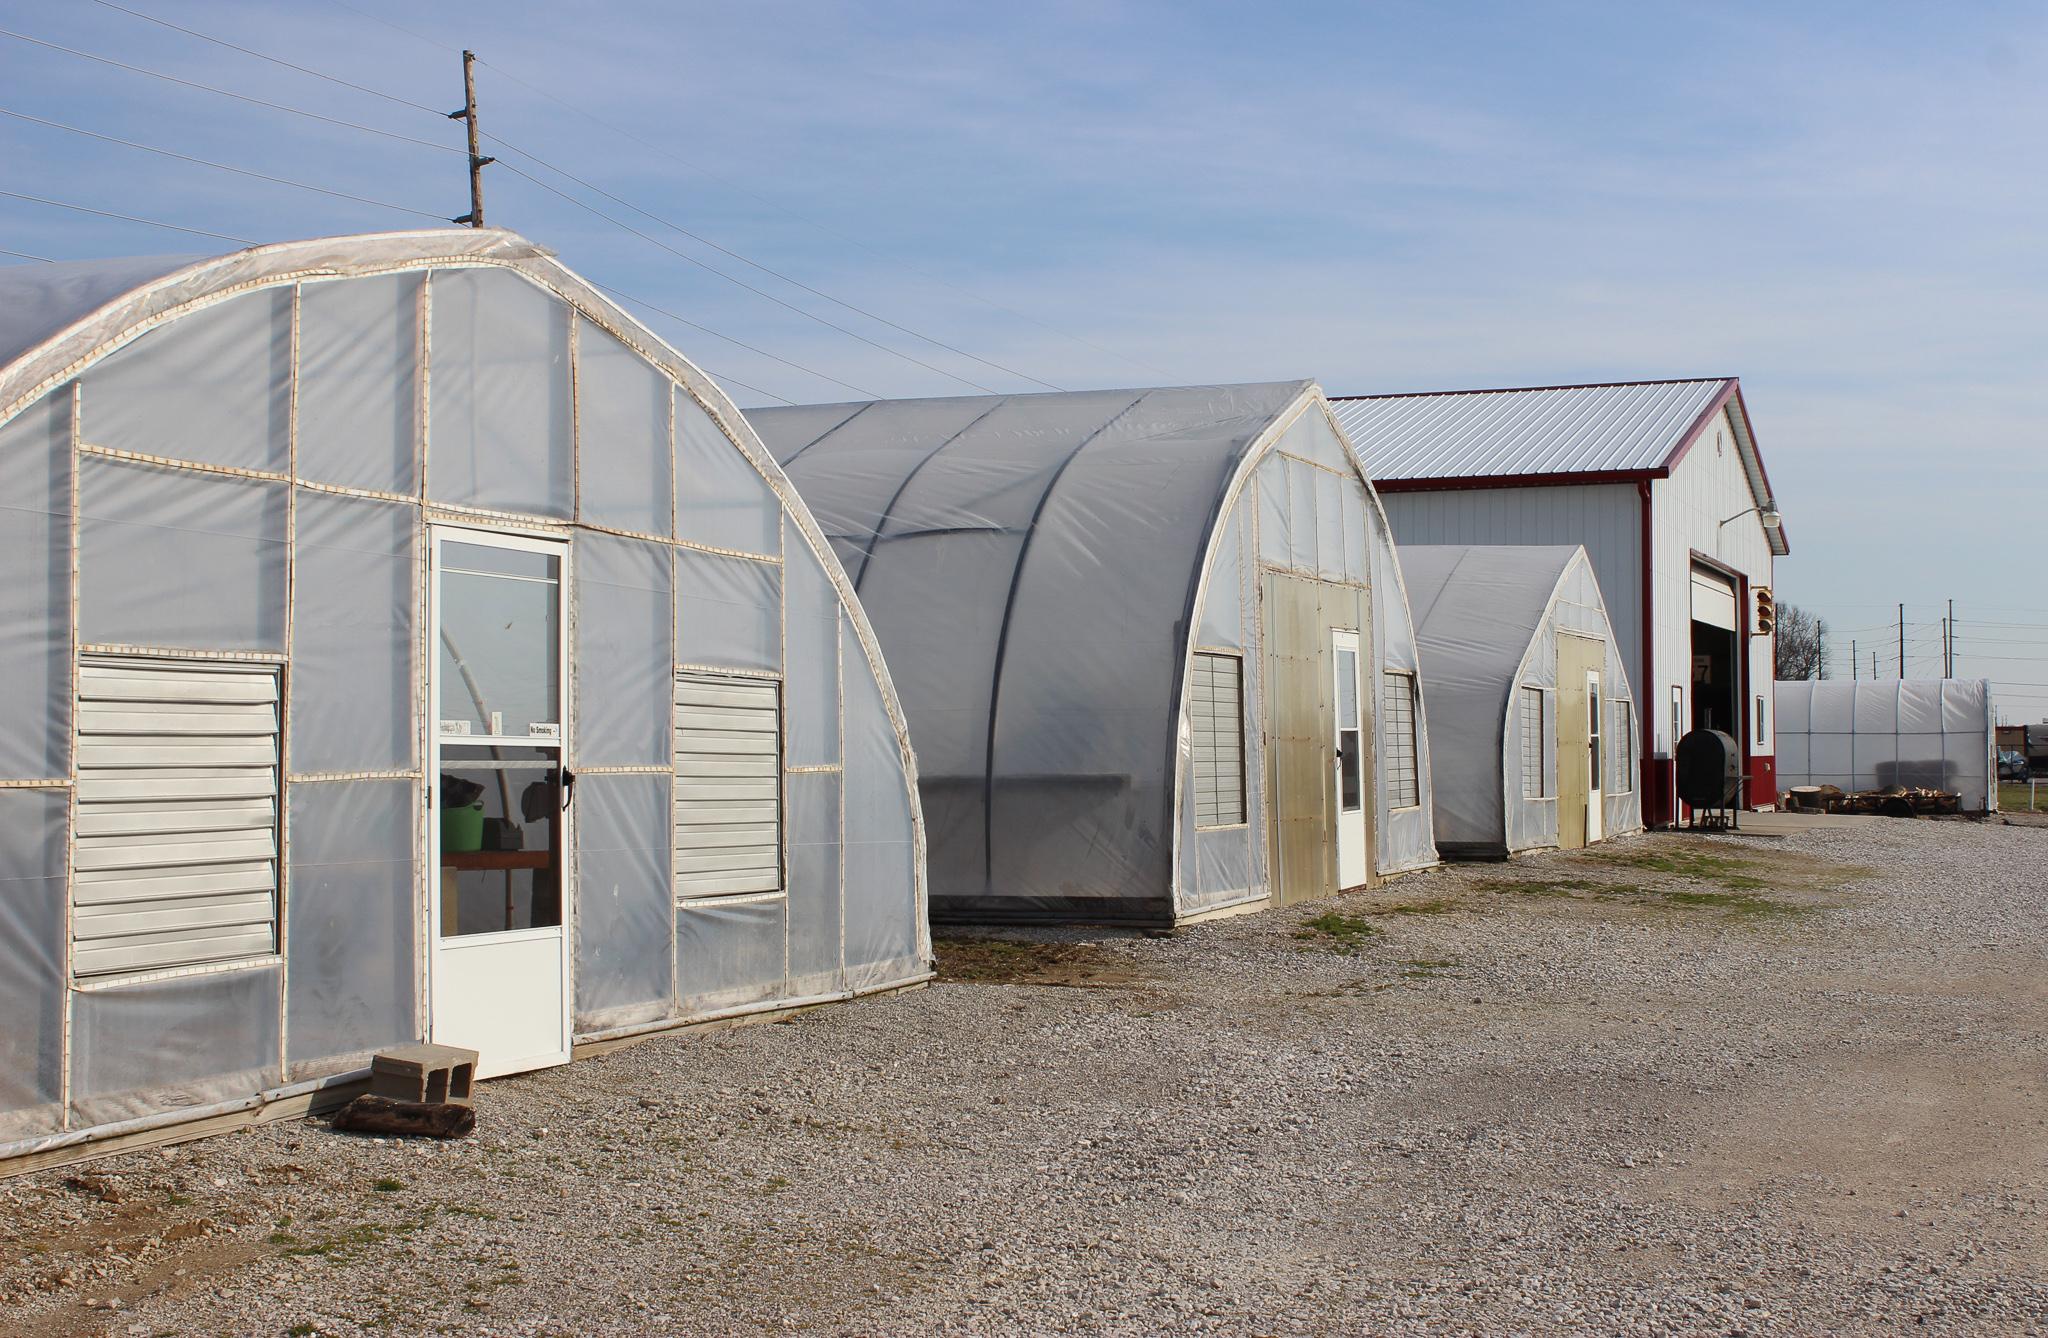 farm 57, evansville farm, evansville flower farm, evansville indiana, indiana flowers, evansville flowers